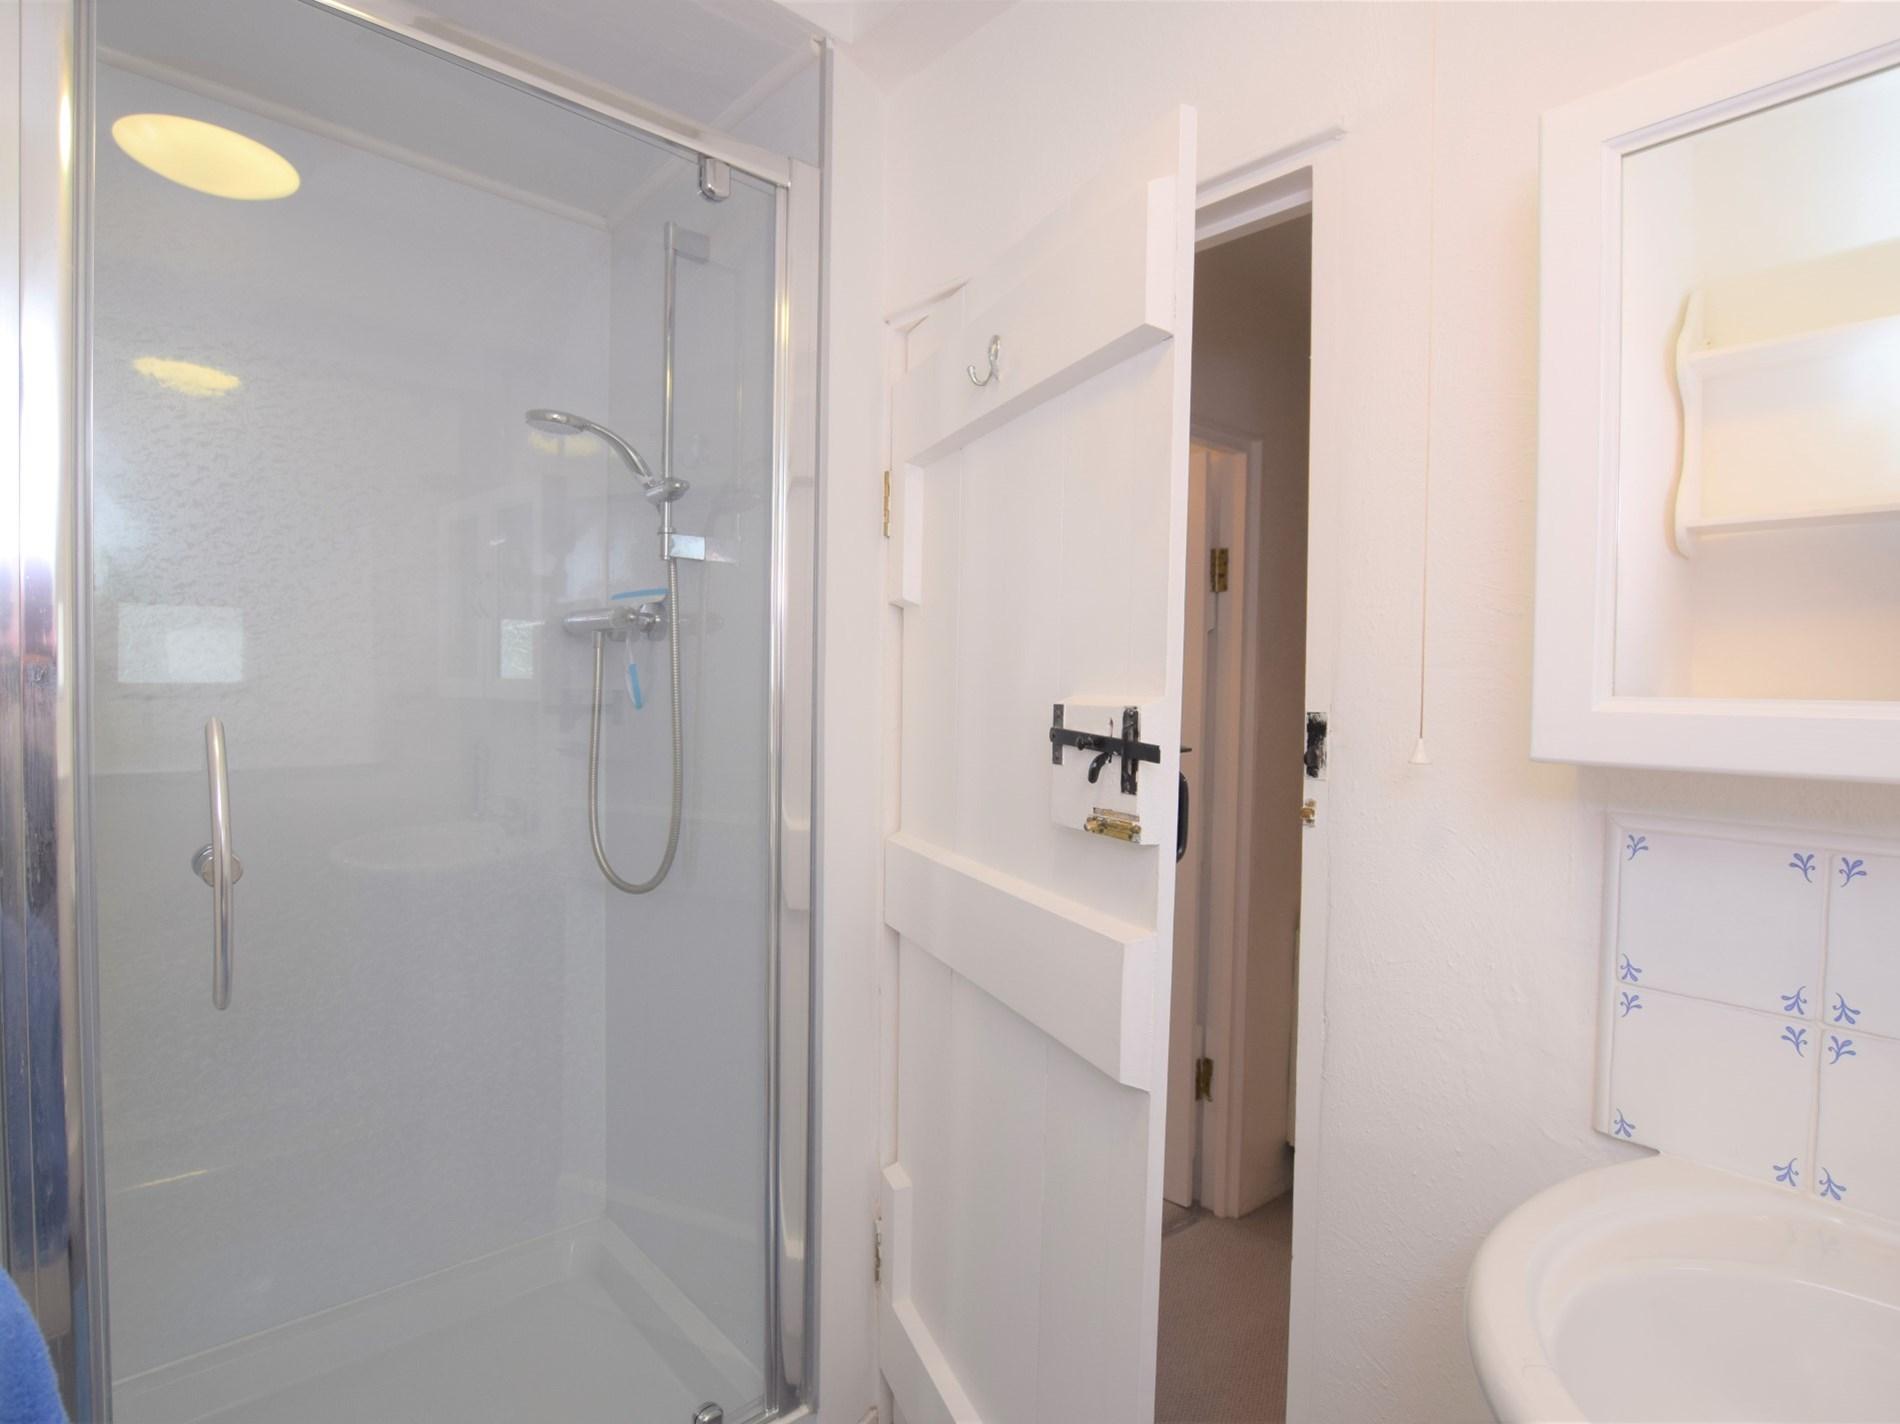 Delightful shower room